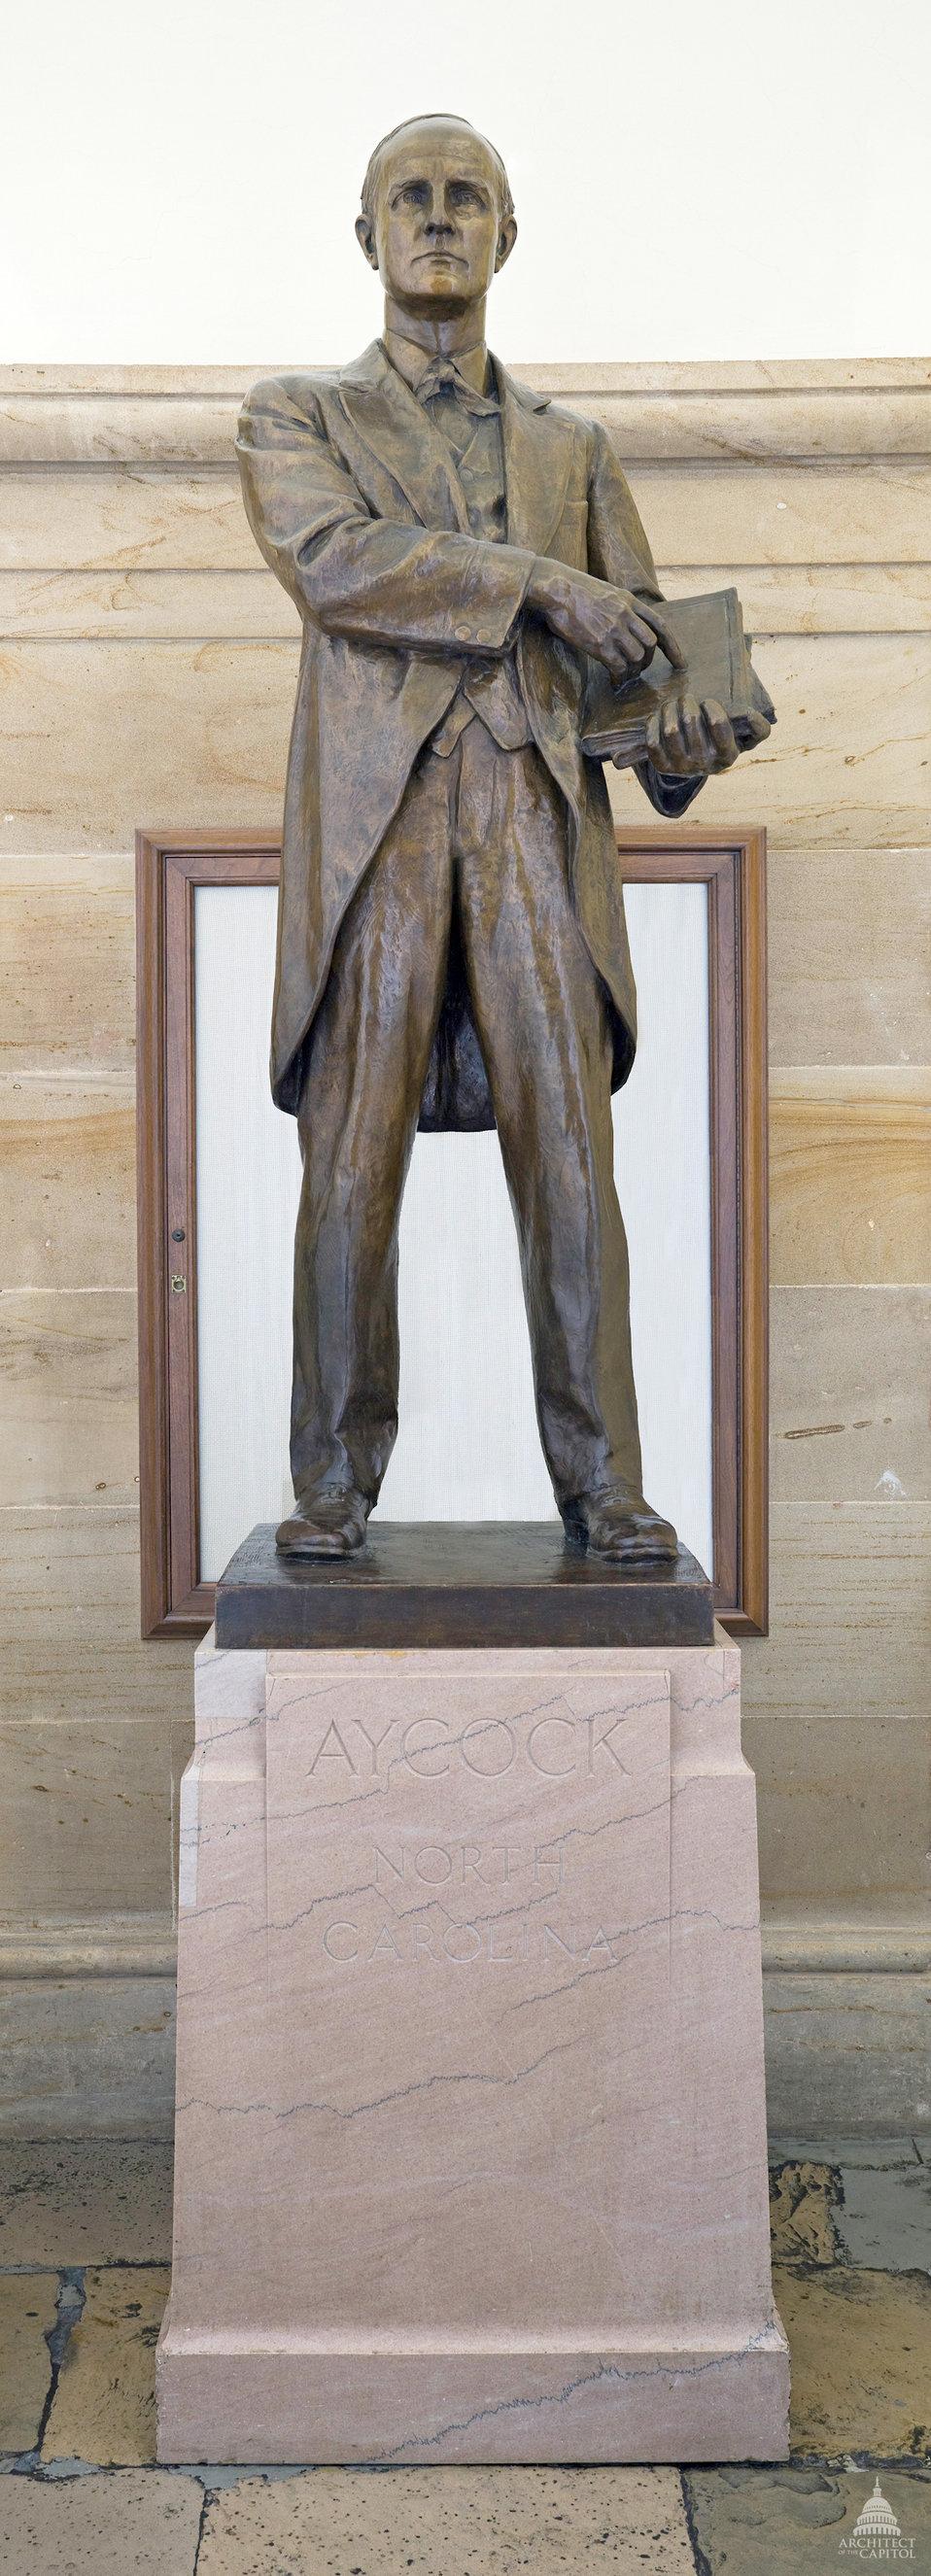 Charles Brantley Aycock Statue